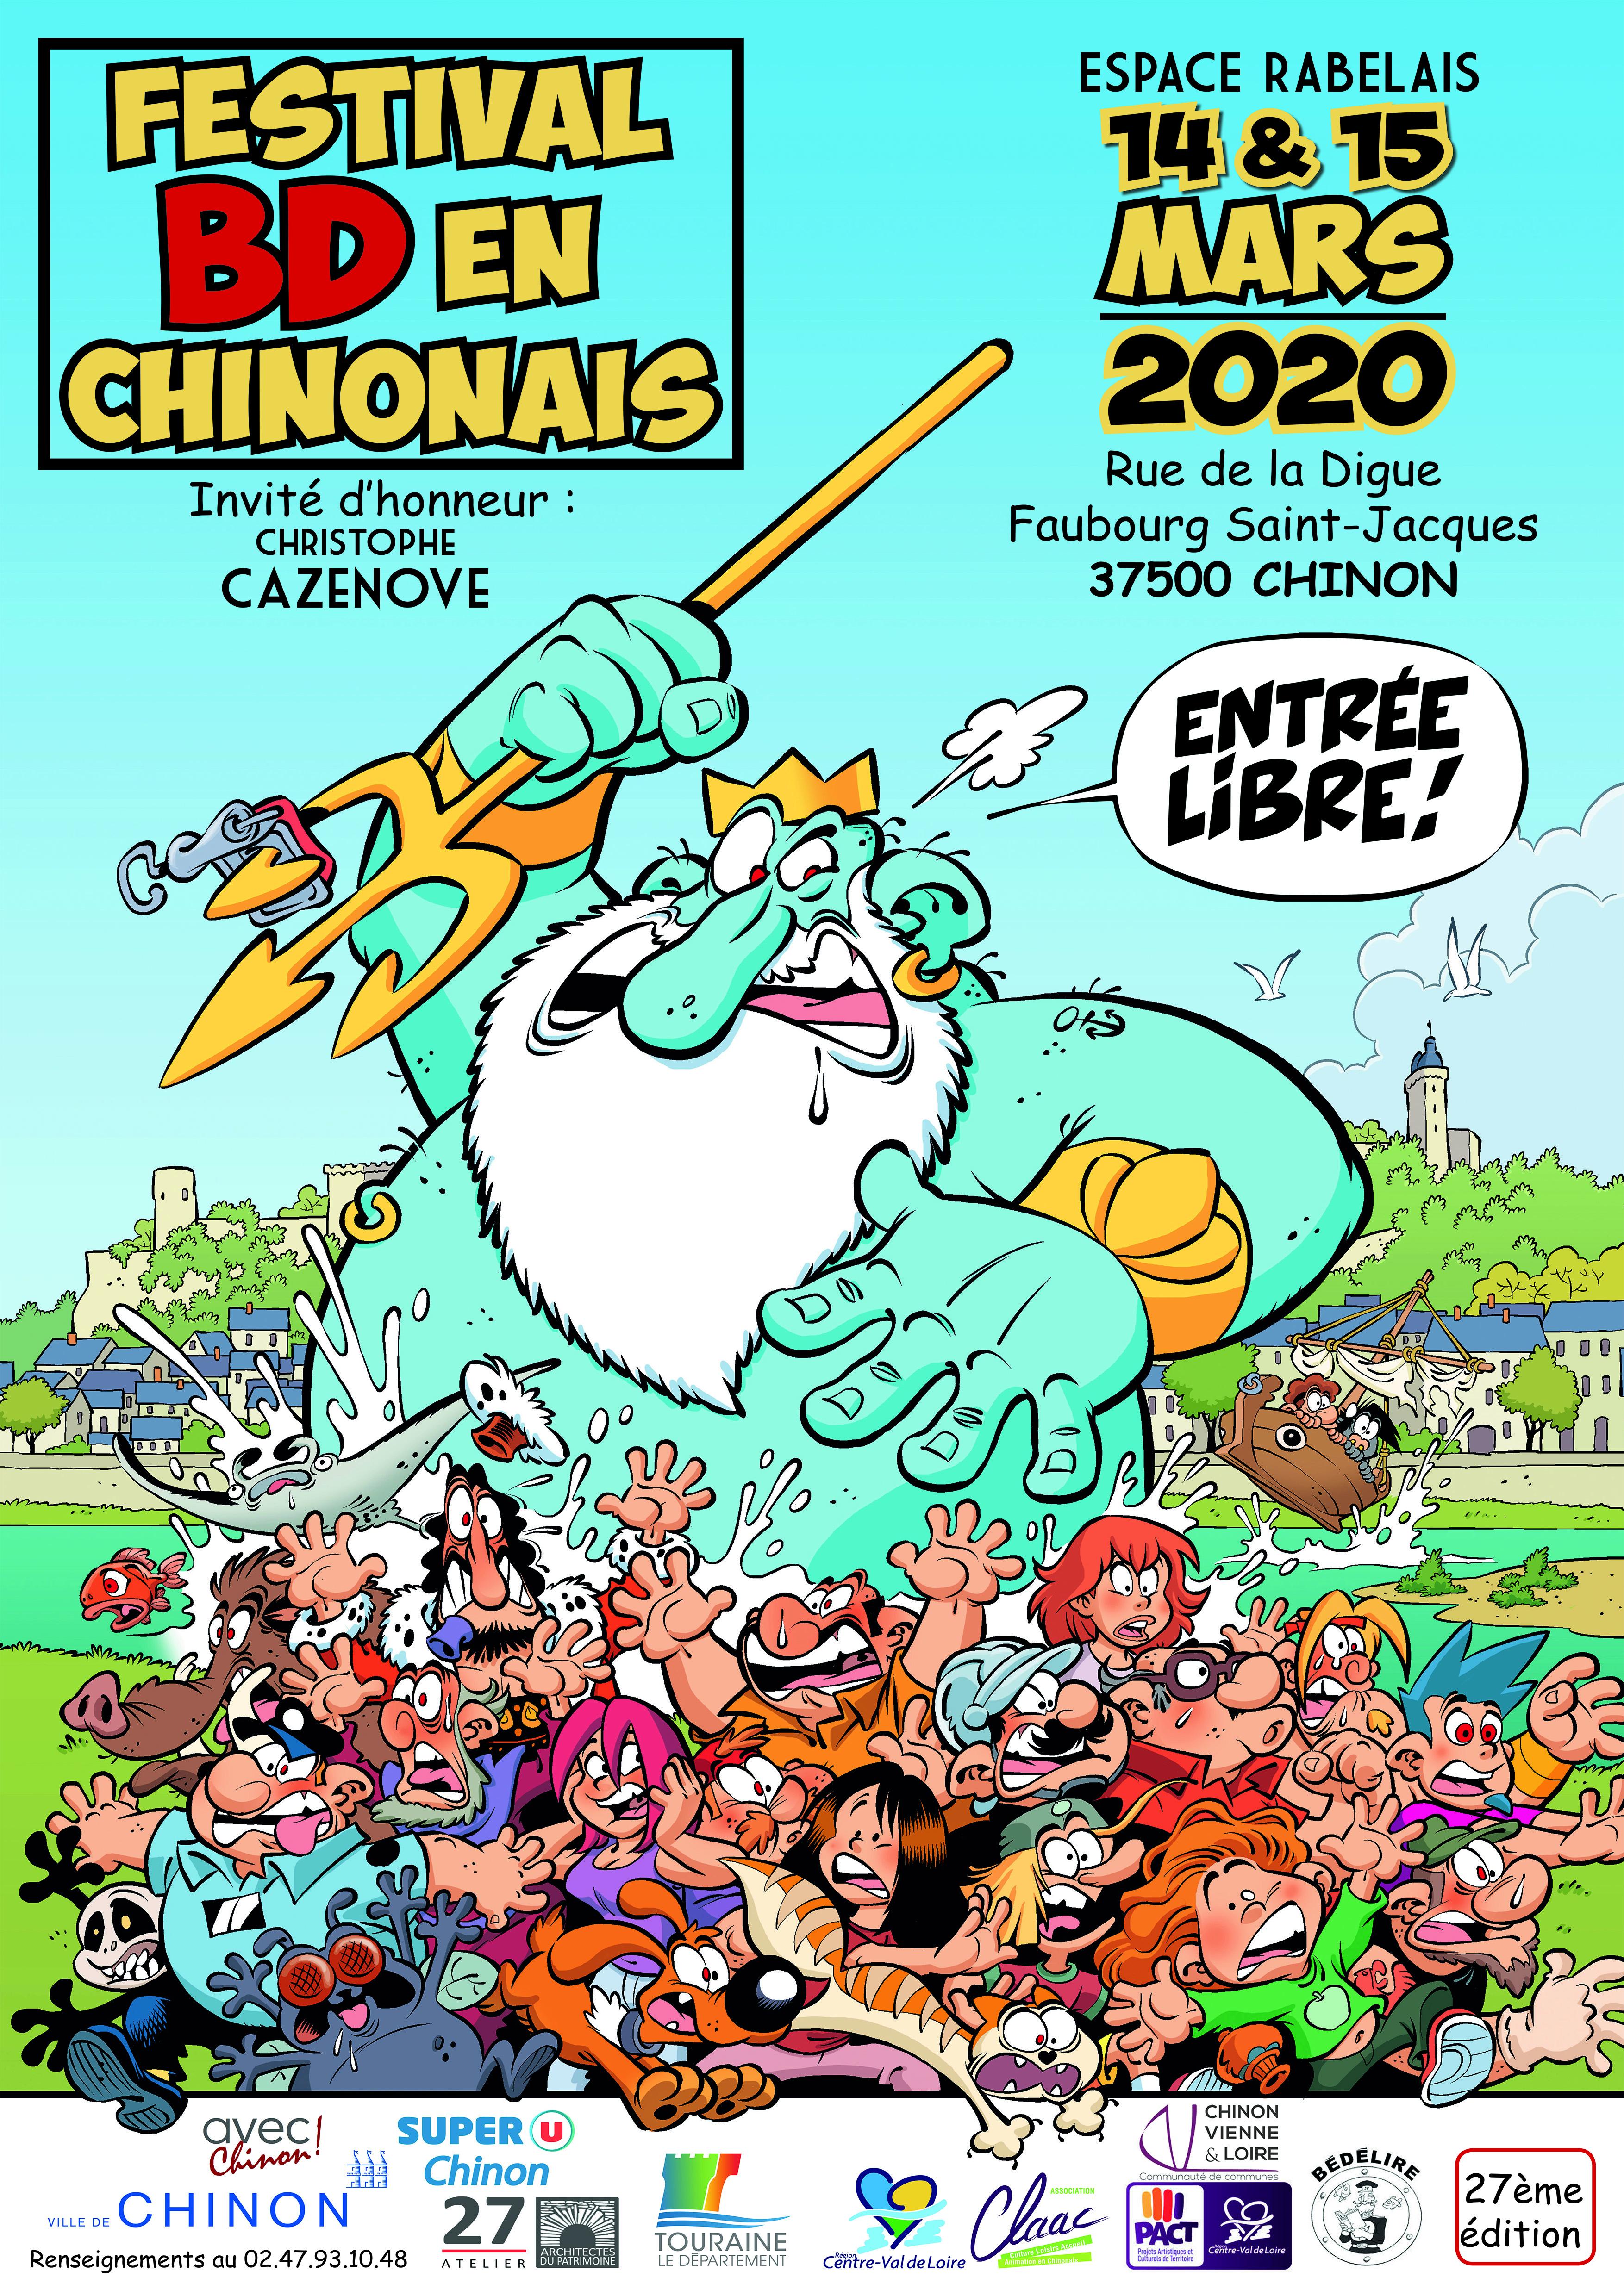 Festival BD en Chinonais